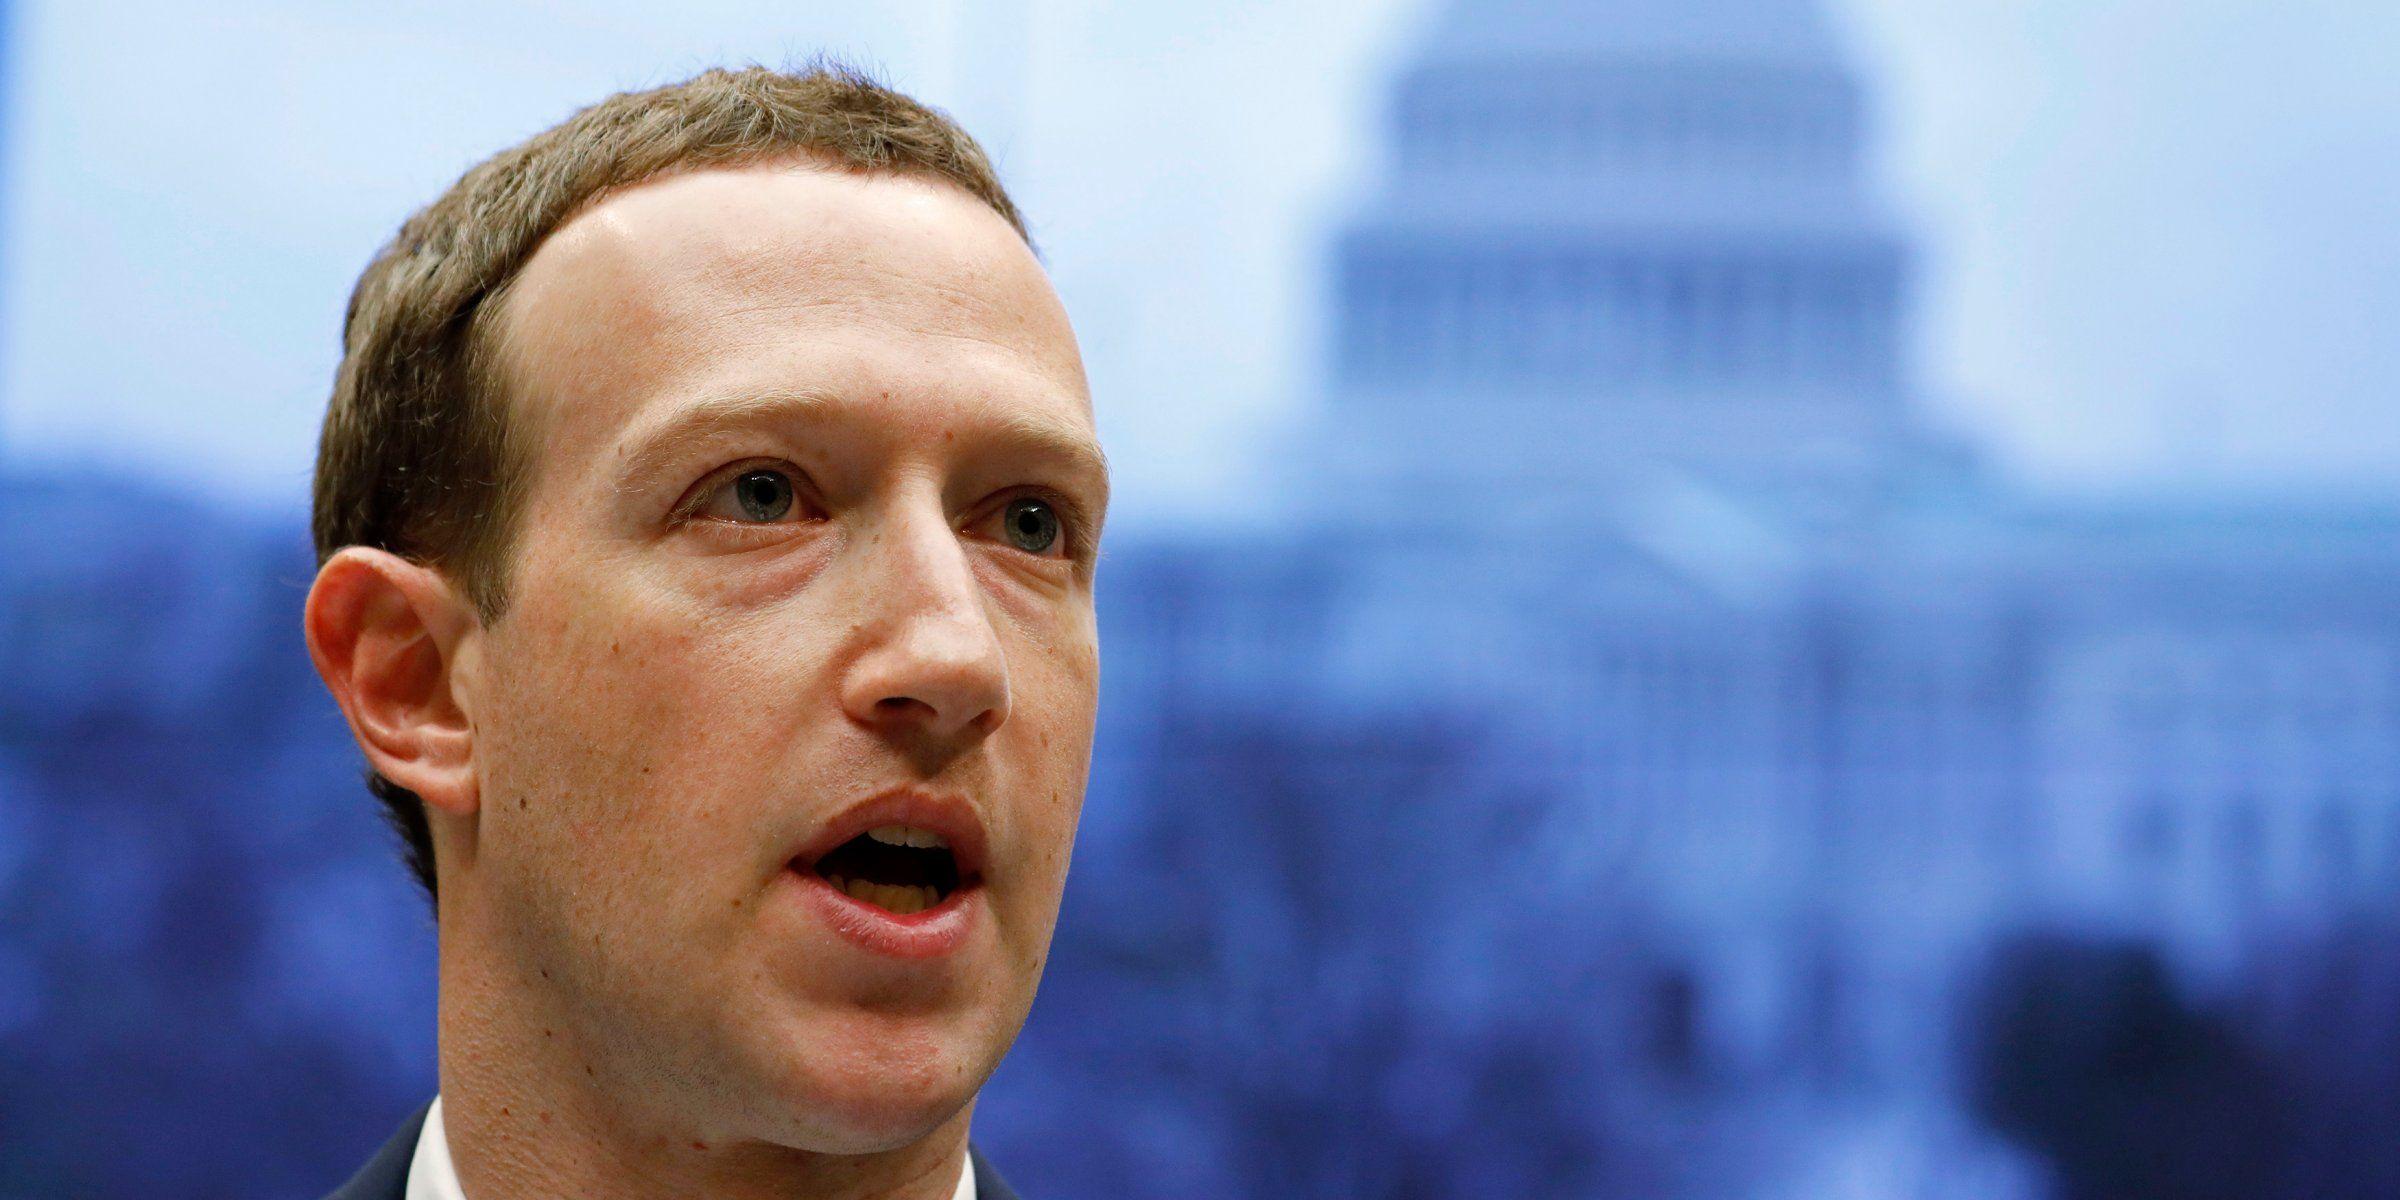 22+ Mark zuckerberg age started facebook ideas